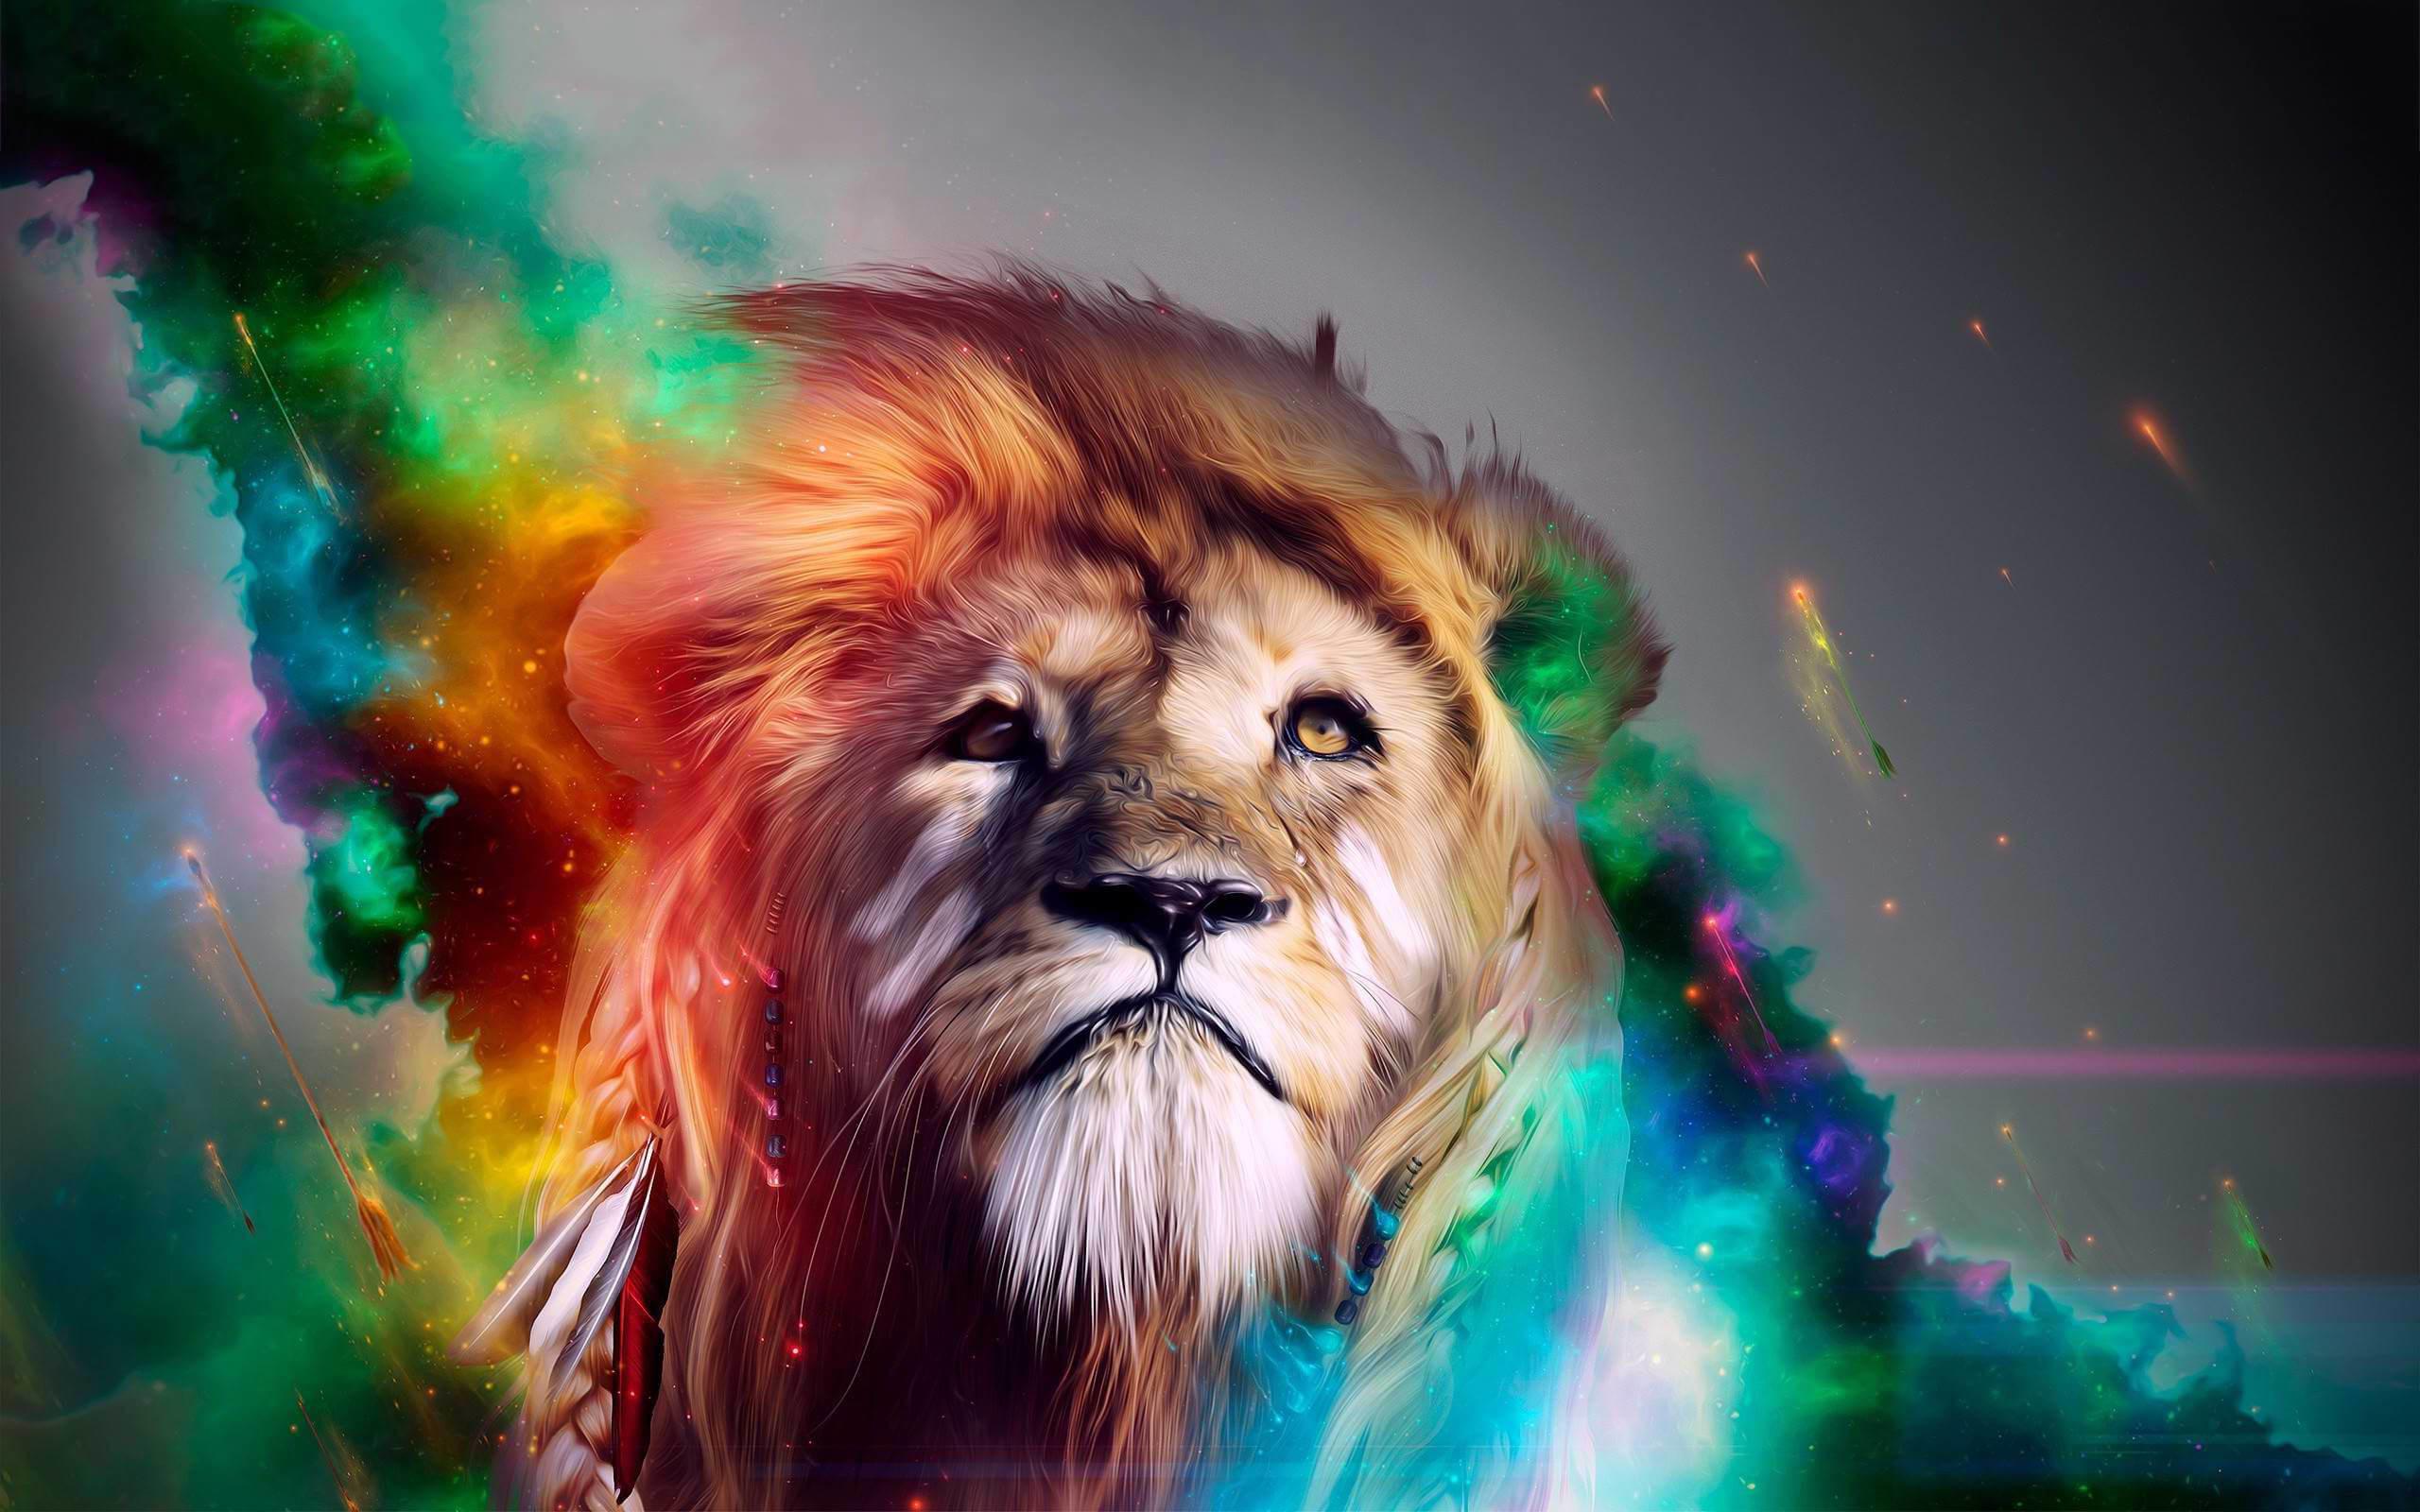 Iphone X Stock Wallpaper Download Rainbow Lion Wallpaper 57 Images